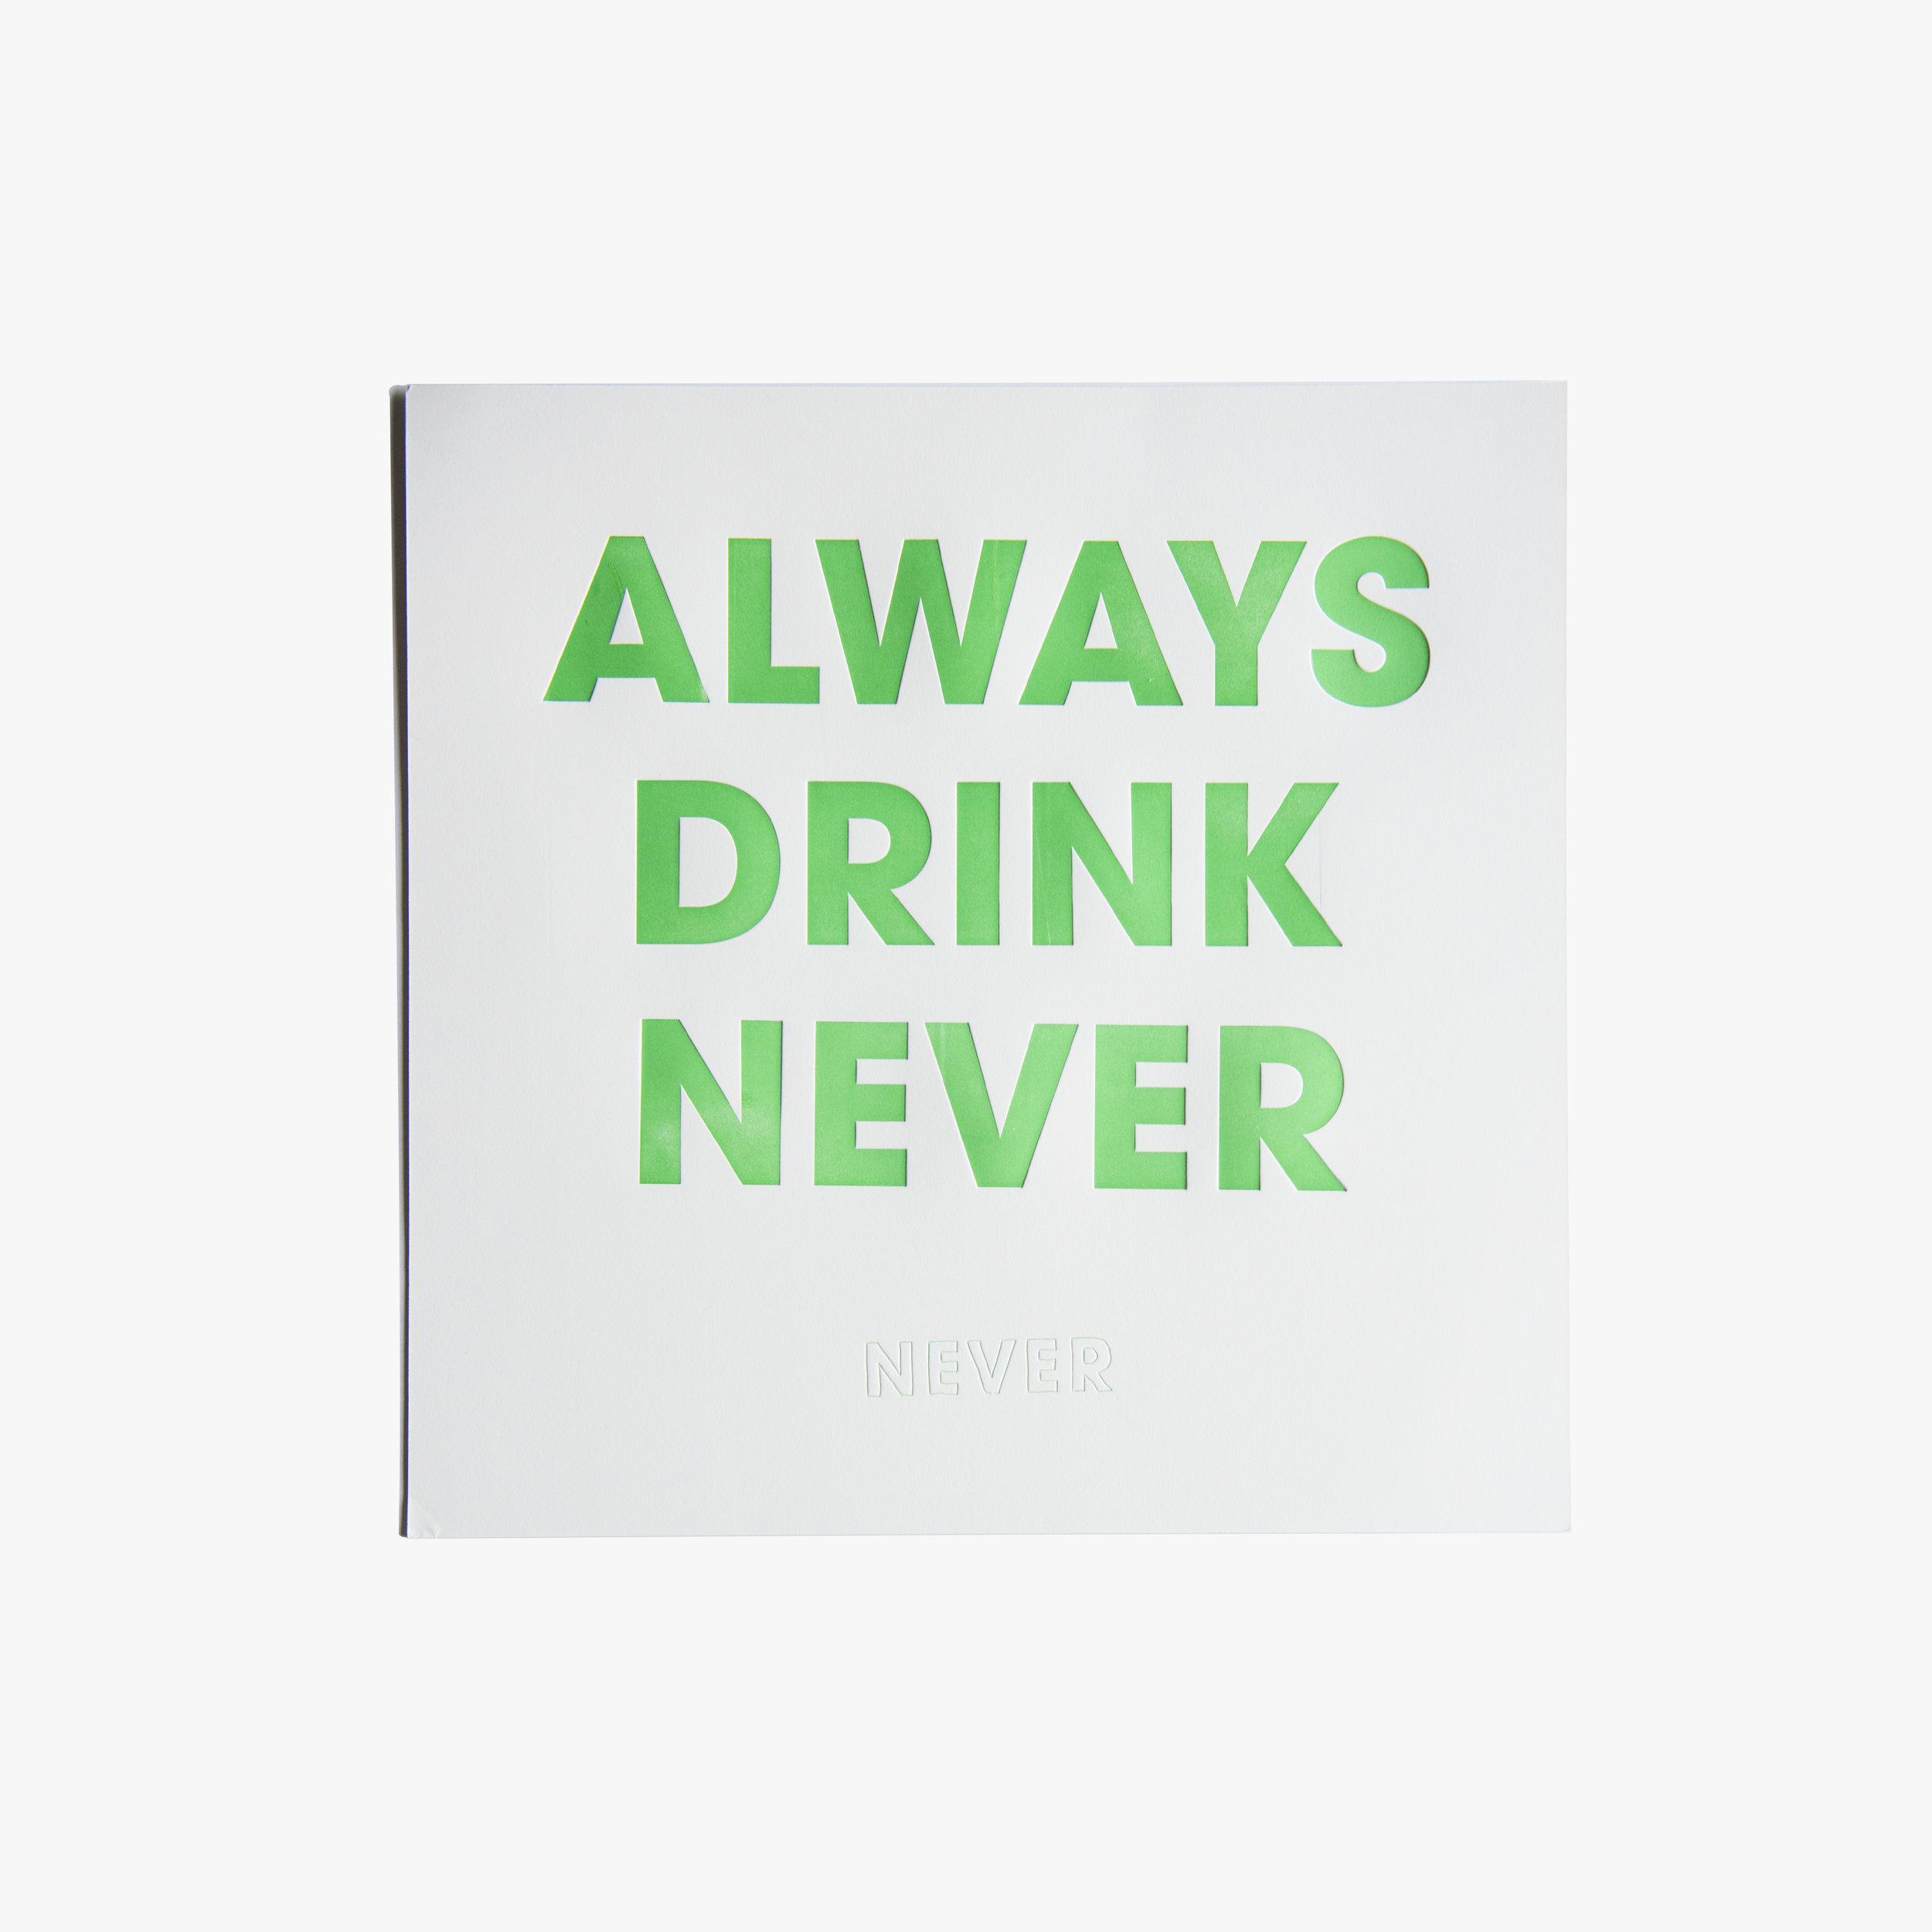 Never_Product_print_green.jpg